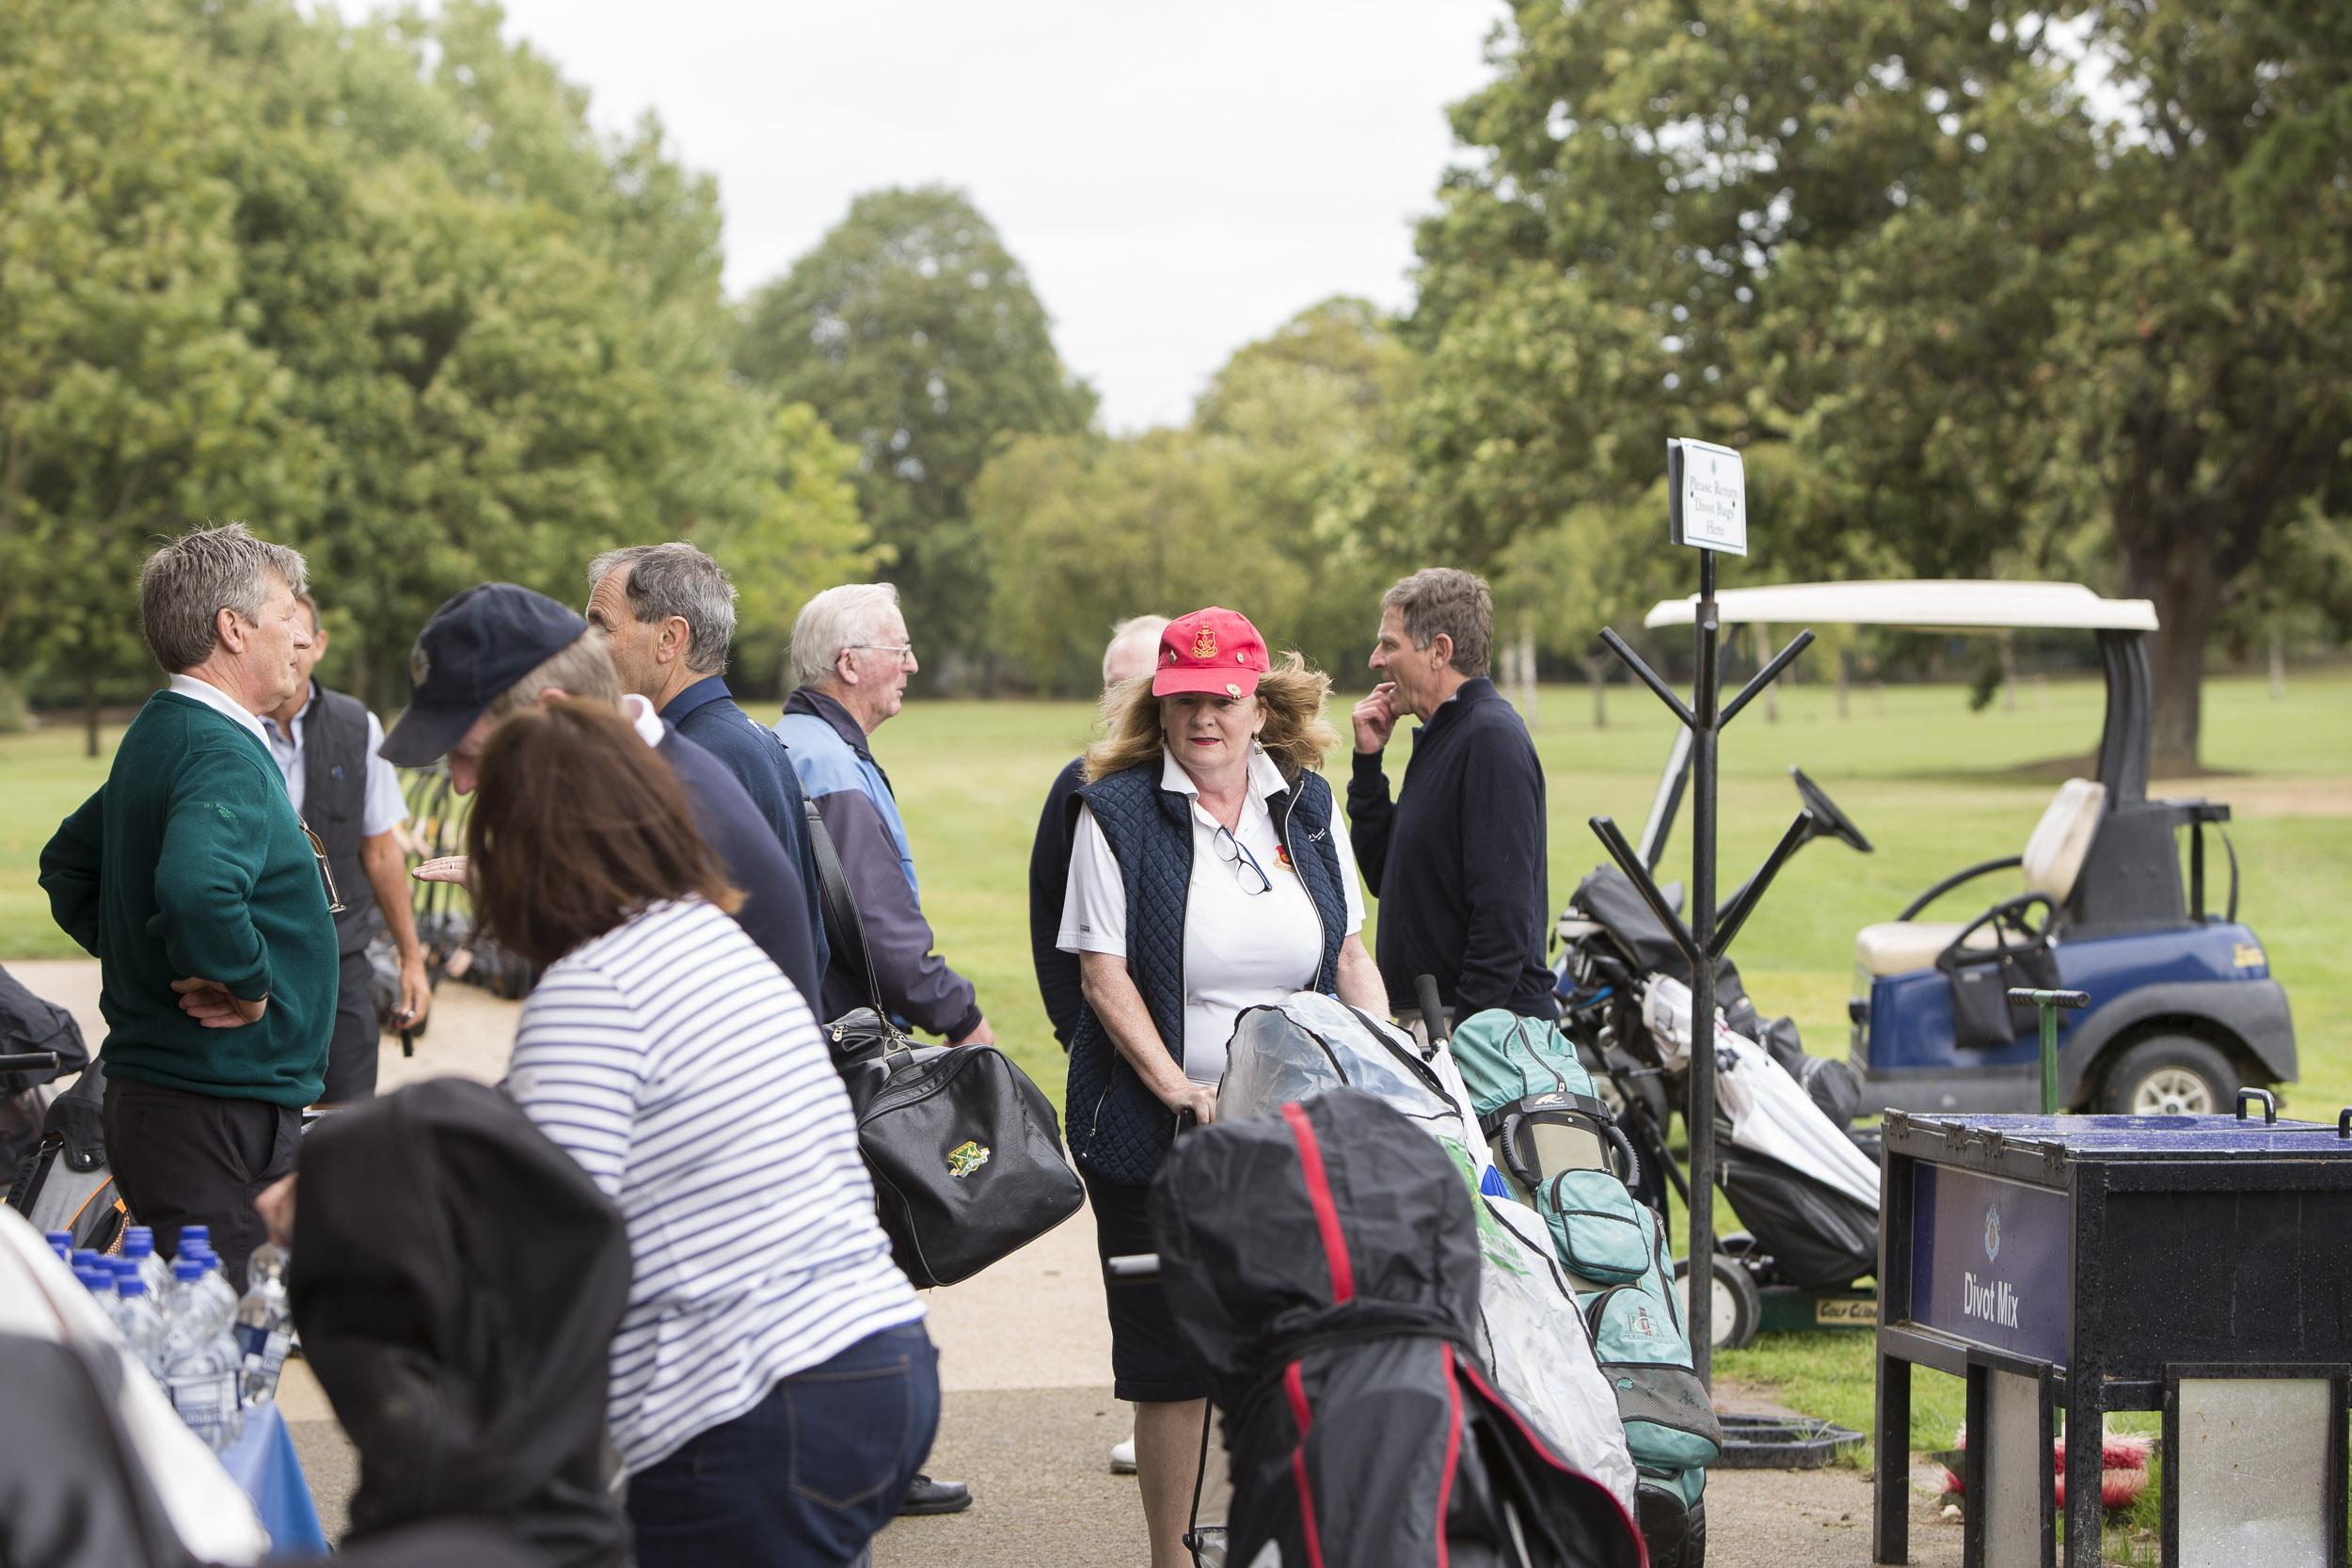 LTavs-Golf-2018-Web-6.jpg